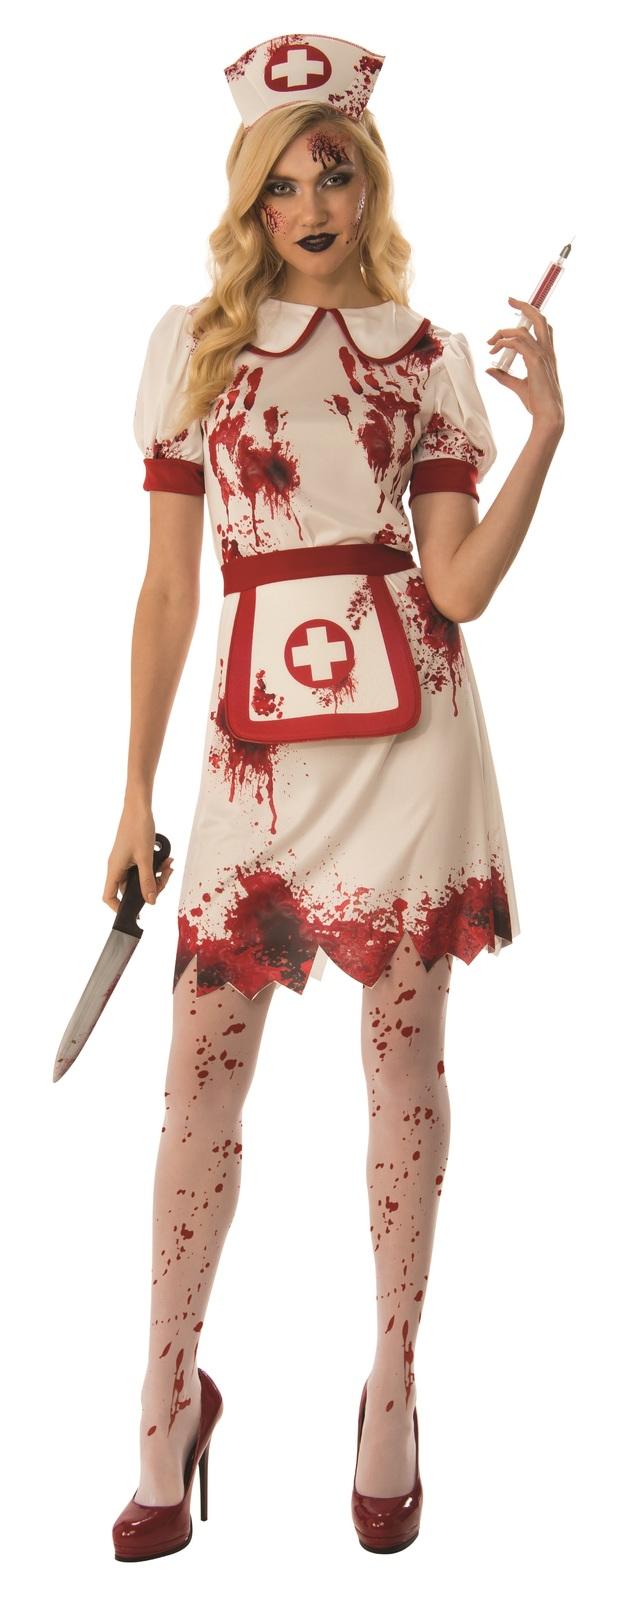 Rubie's: Bloody Nurse - Women's Costume (Medium) image